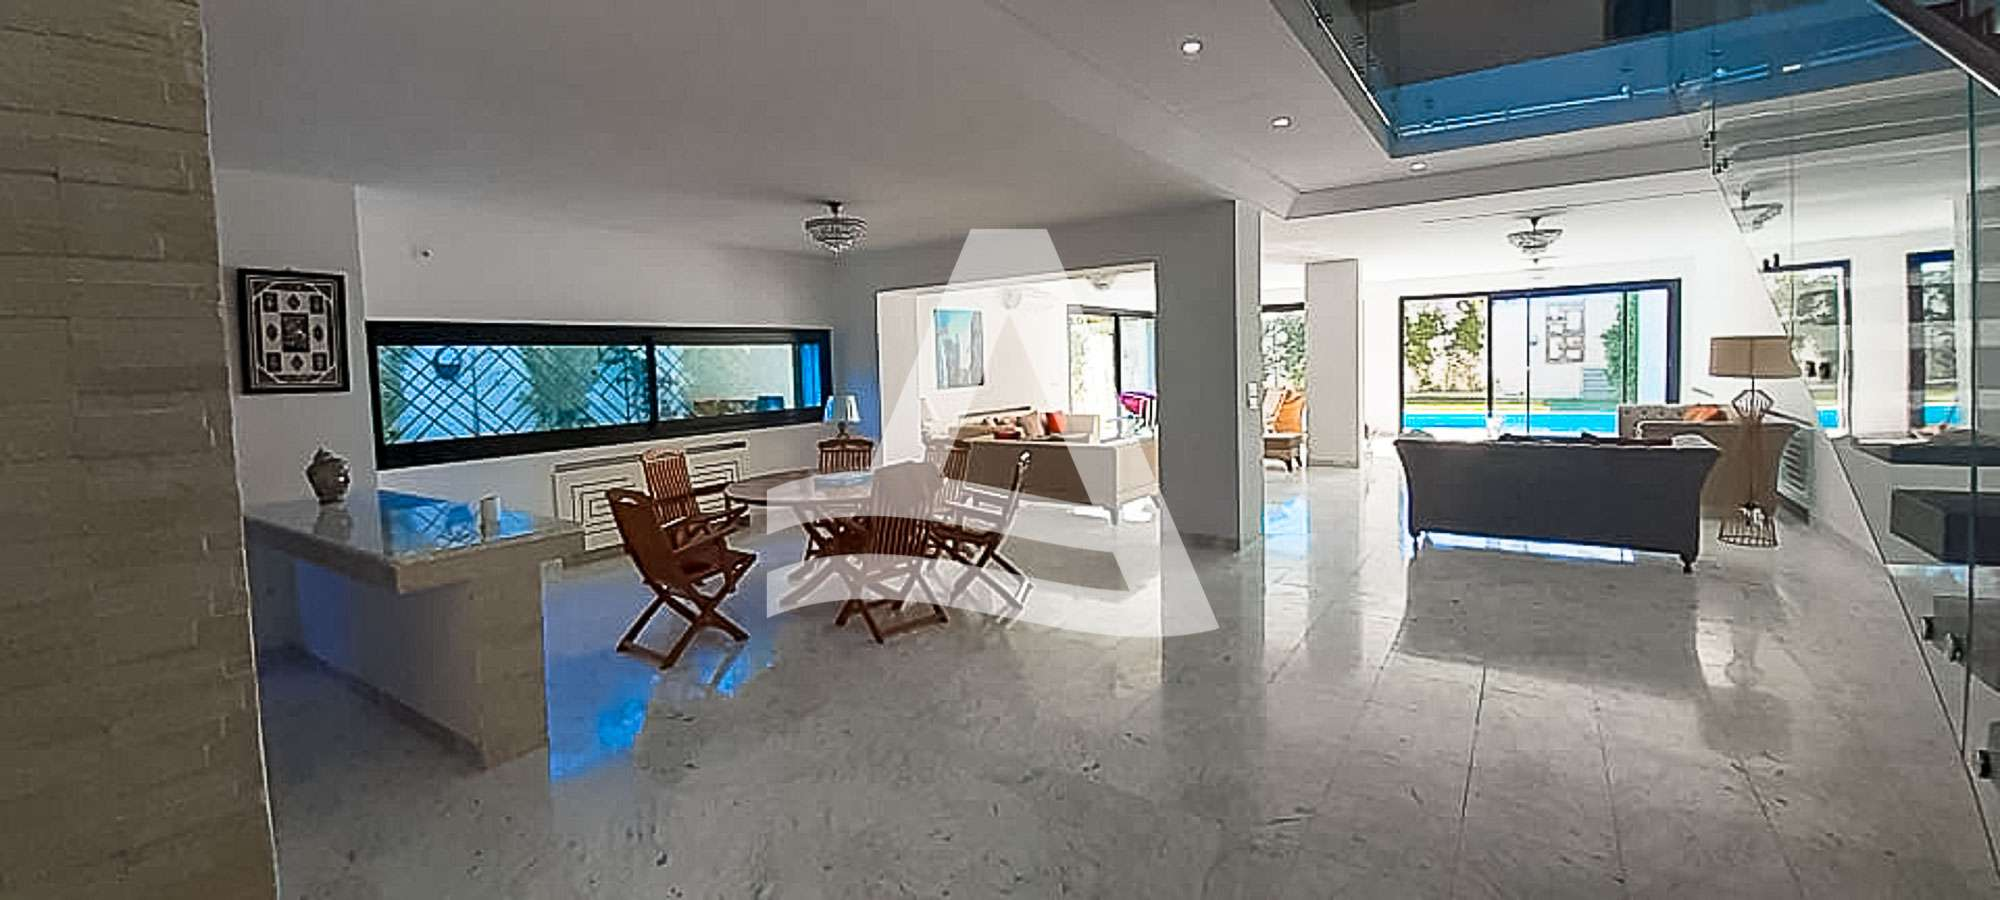 httpss3.amazonaws.comlogimoaws_Arcane_immobilière_la_Marsa-_location_-_vente_la_marsa_5_sur_21_1574354370797-1